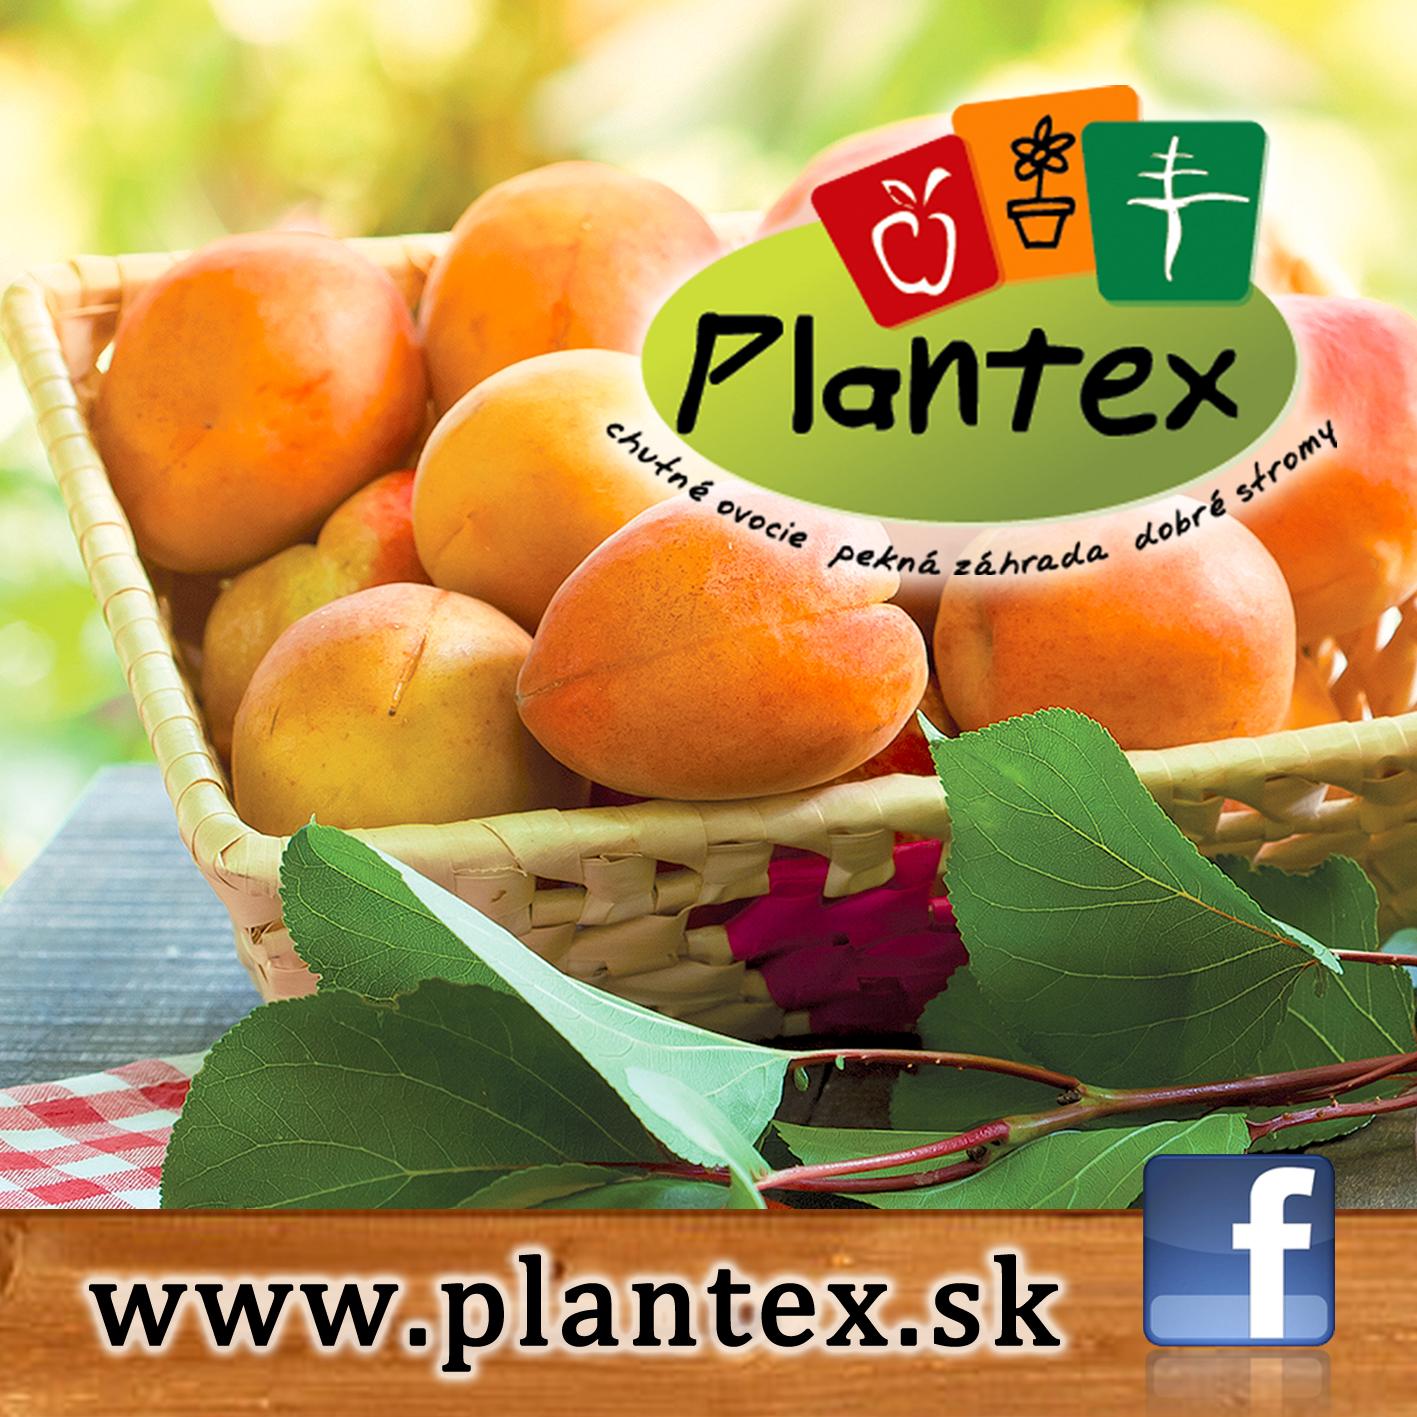 Plantex marhule